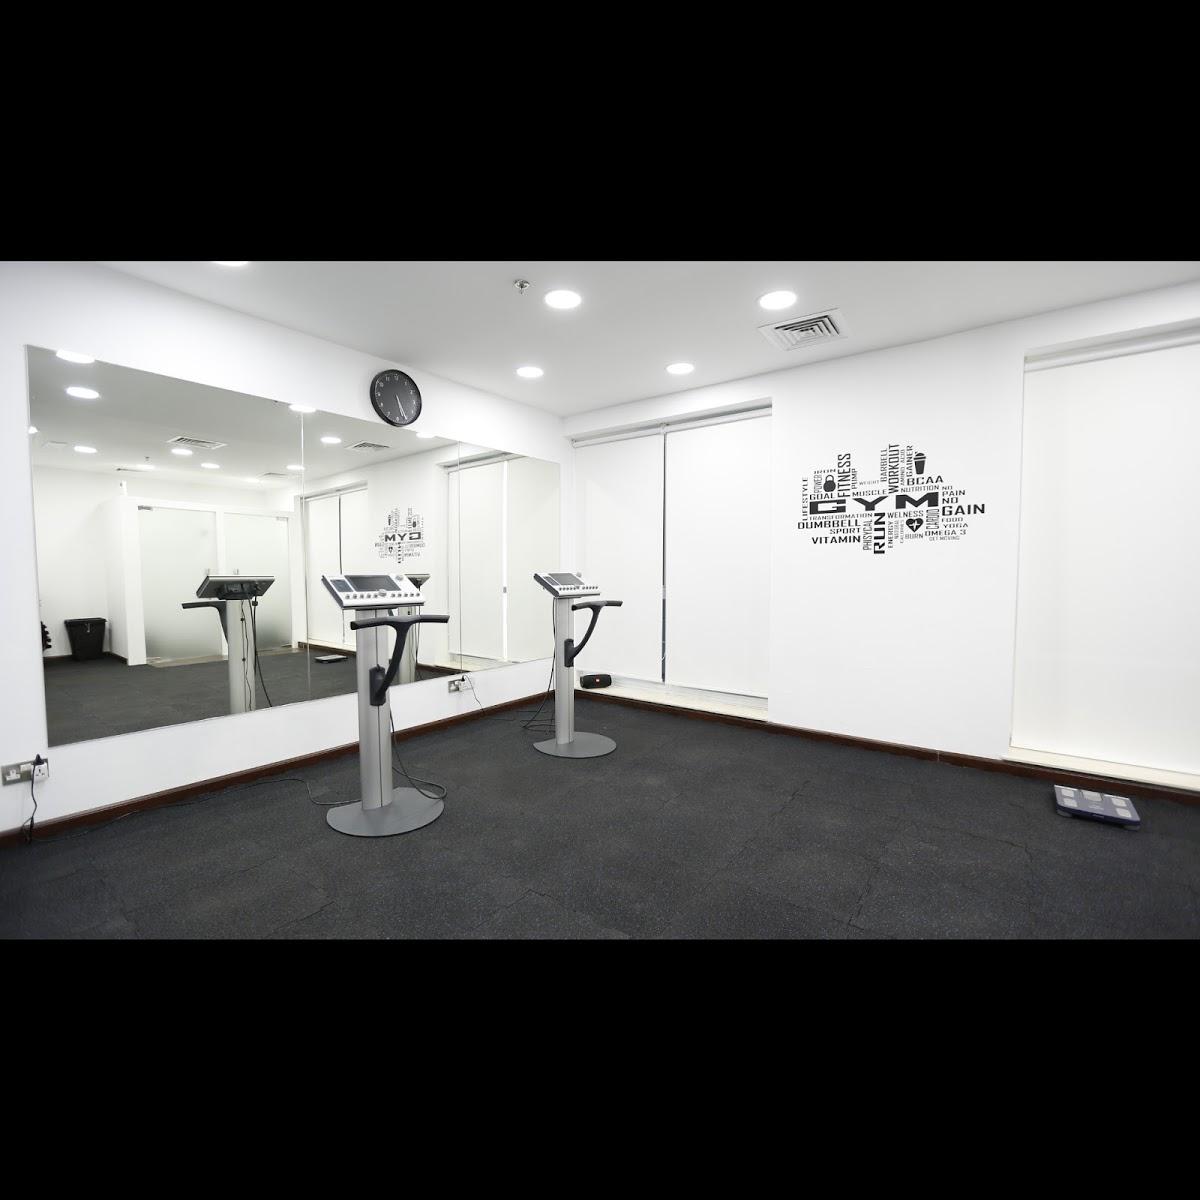 Future Fitness World EMS Club Dubai